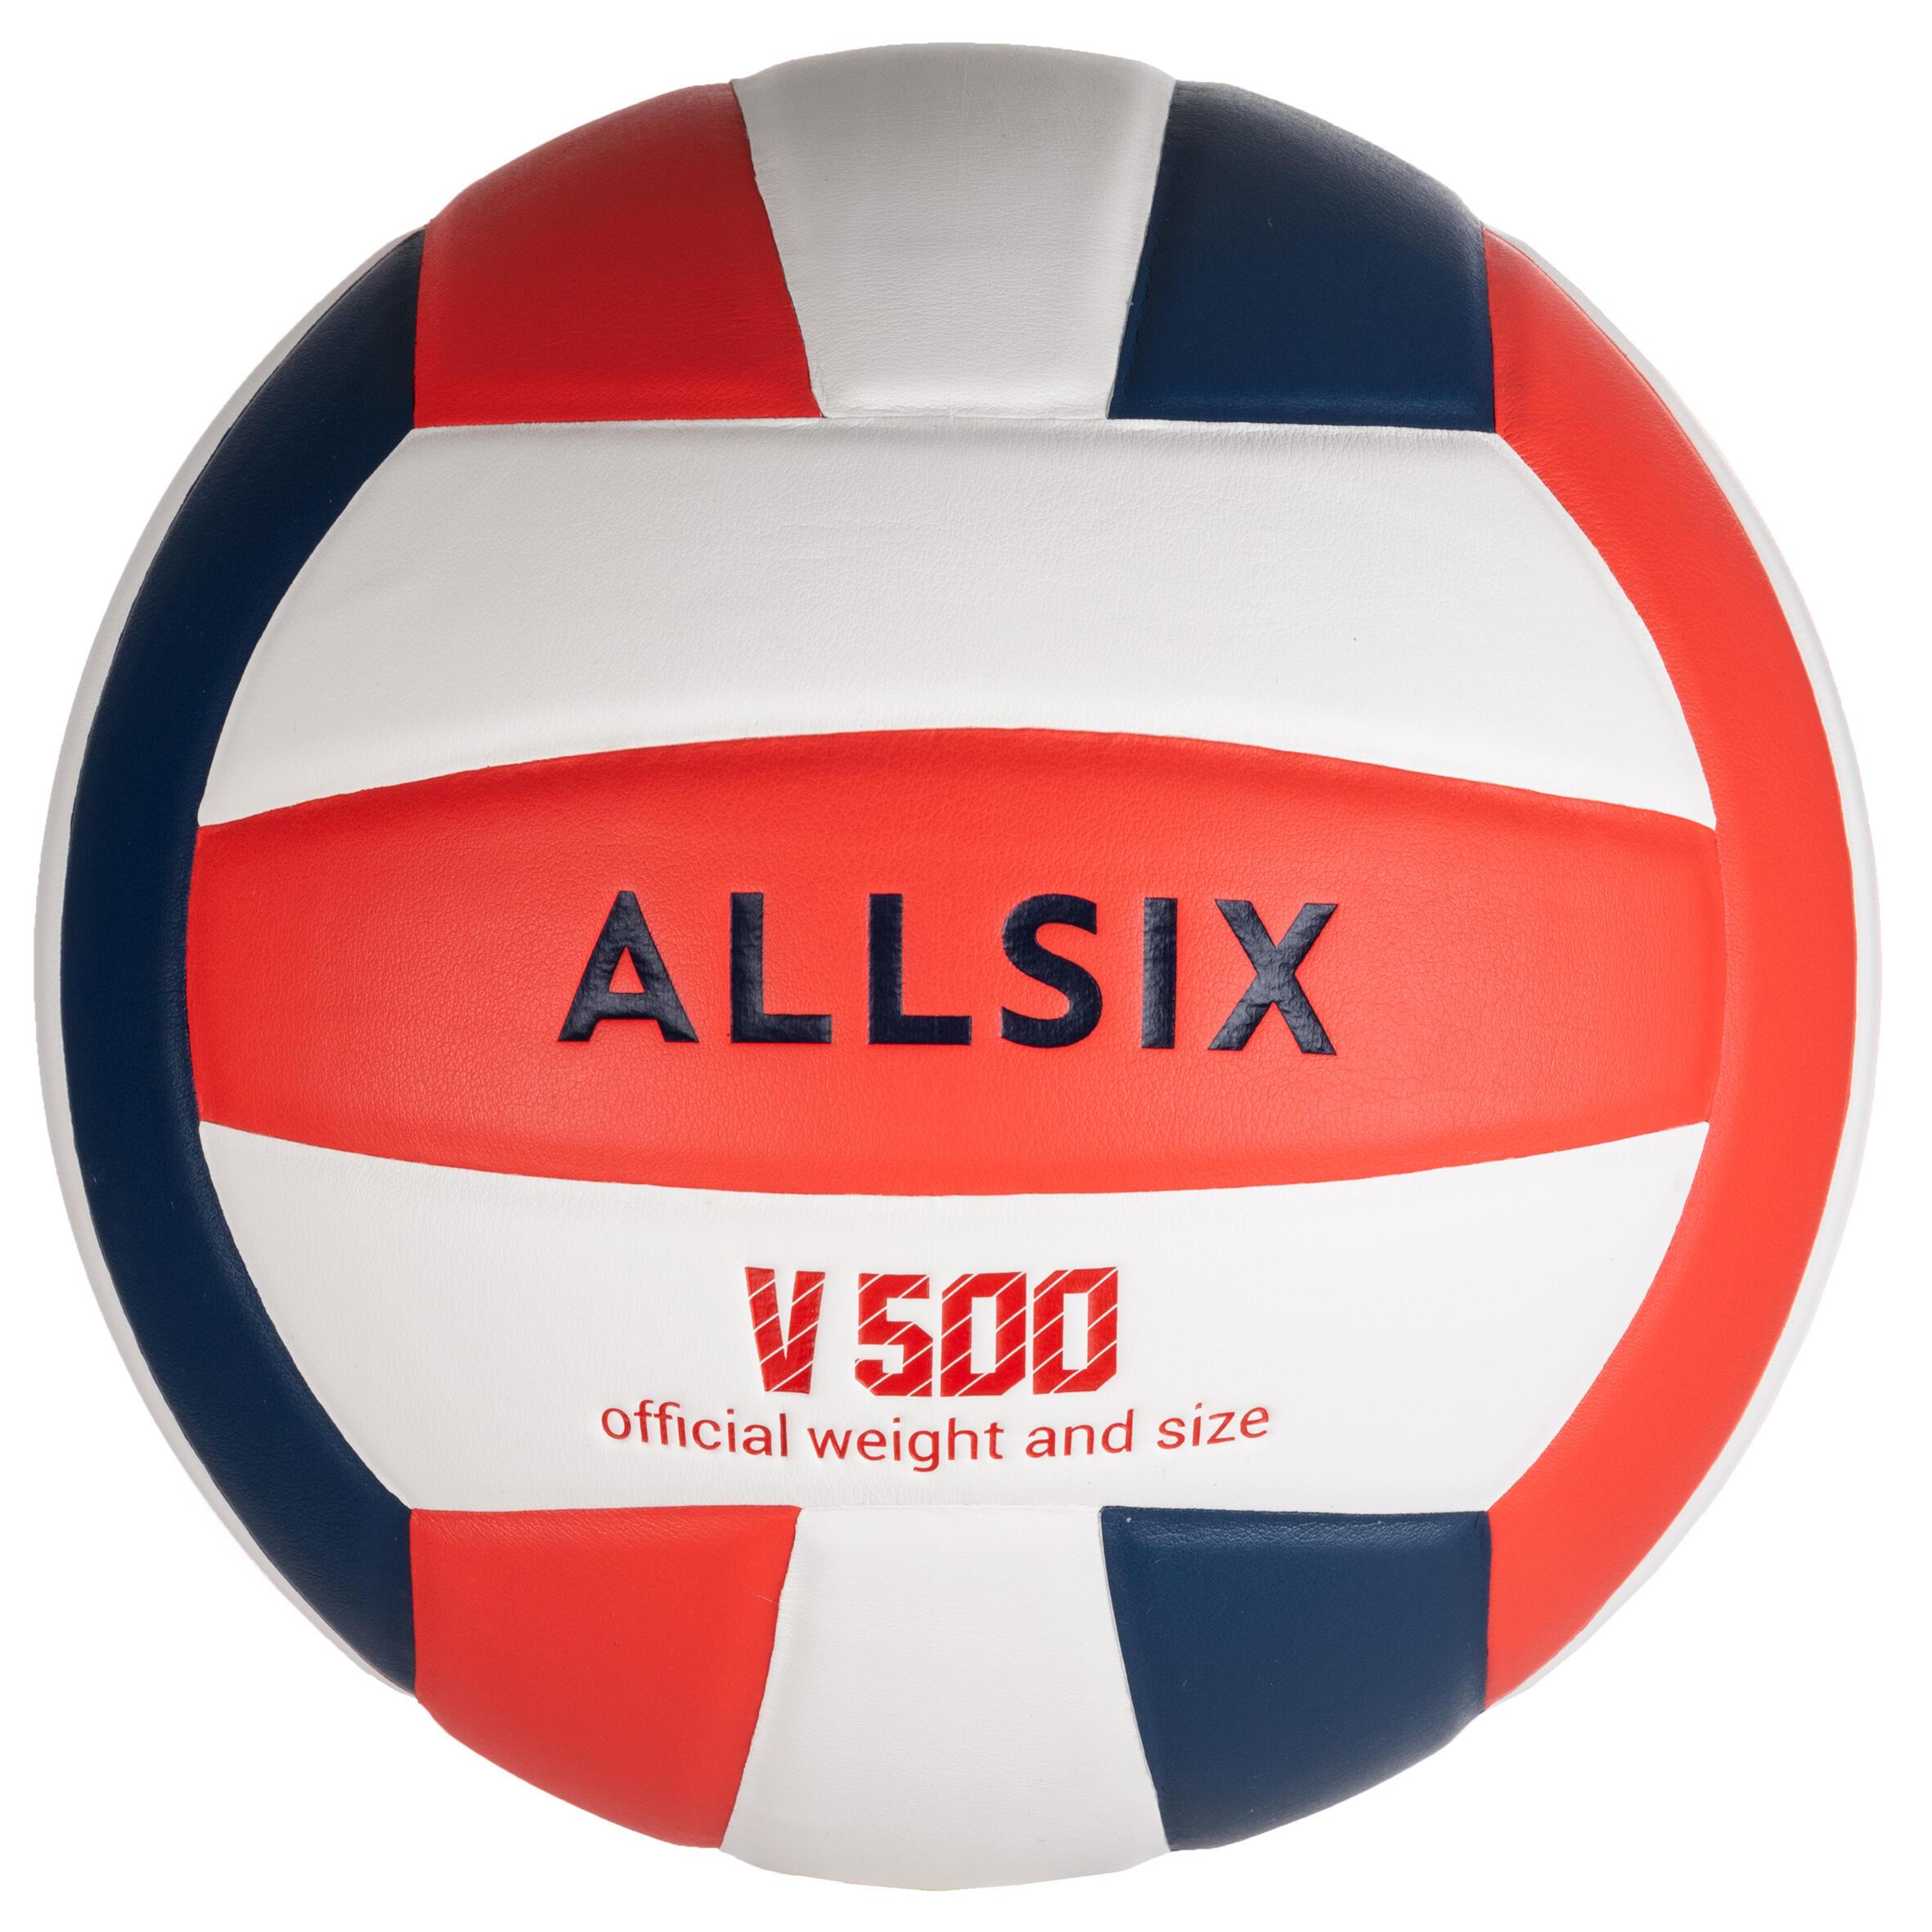 Ballon de volley-ball V500 blanc, bleu et rouge